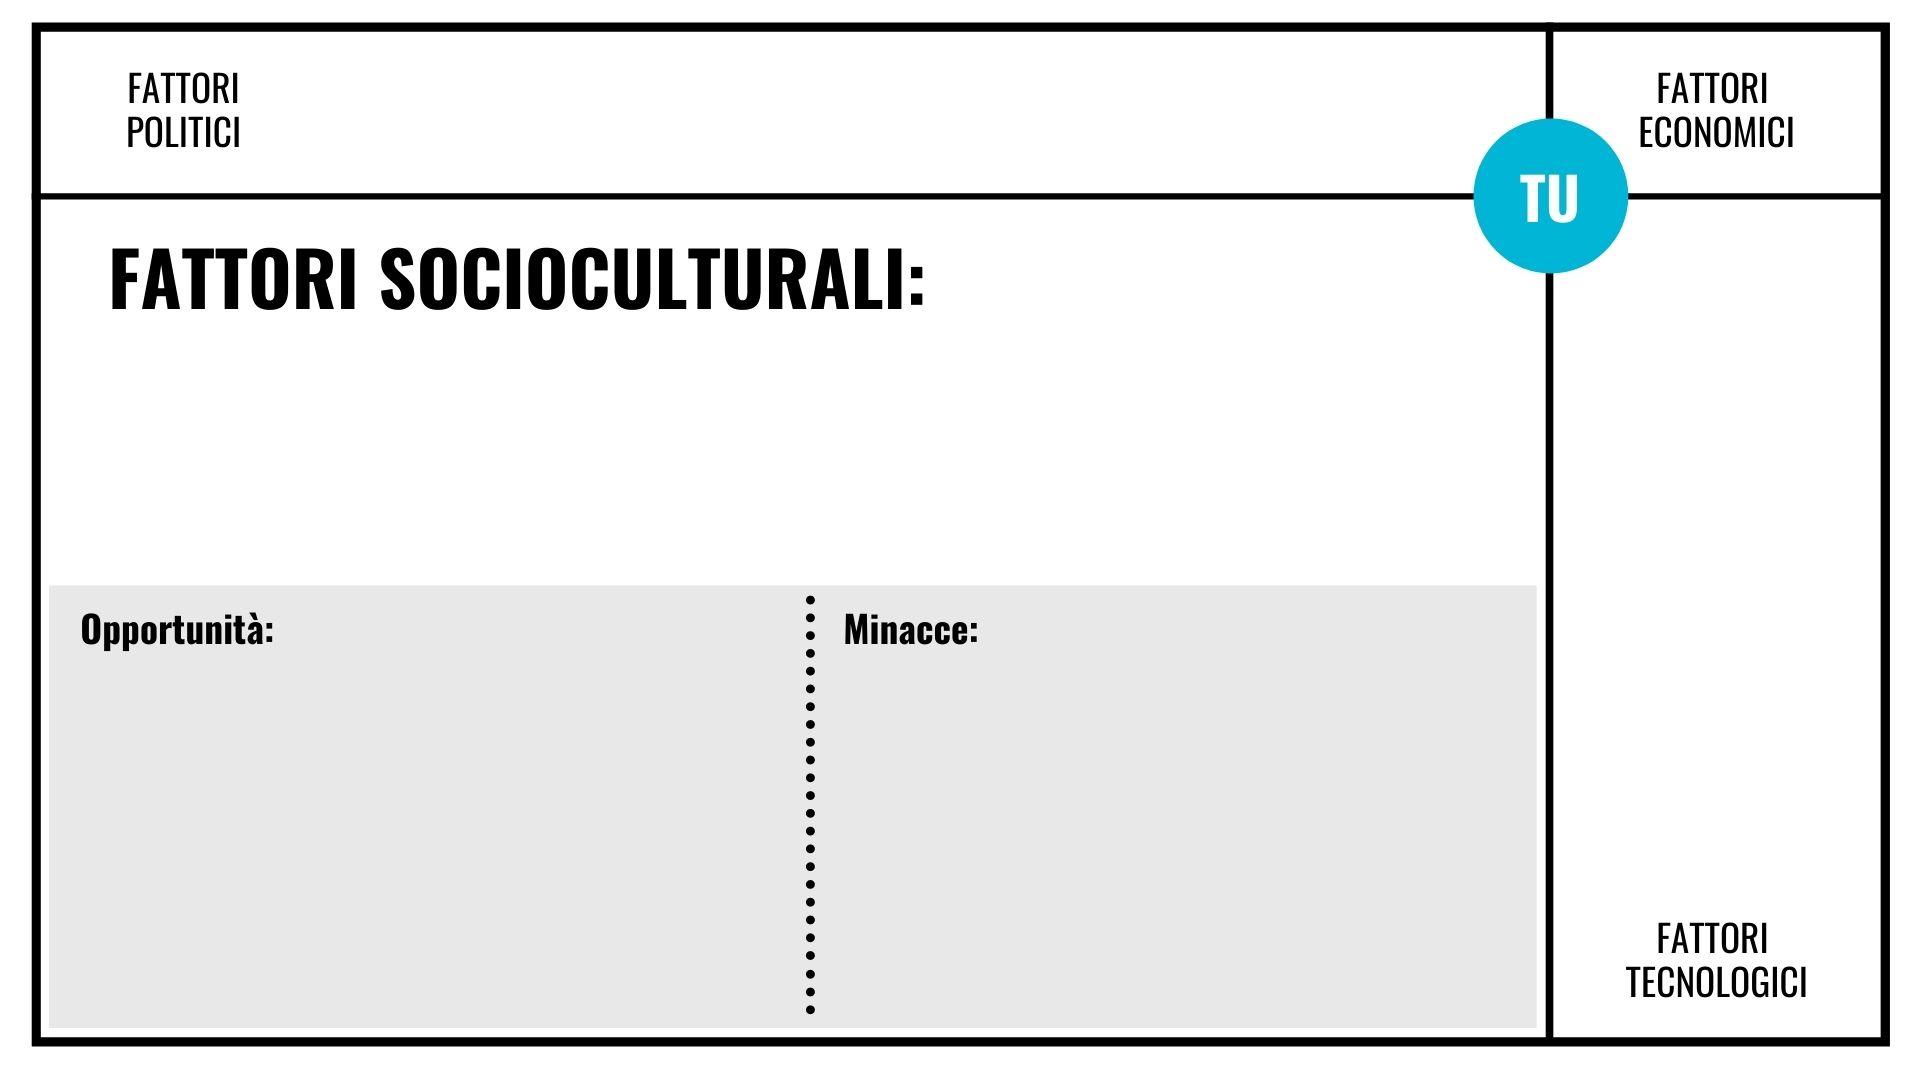 Matrice analisi PEST Fattori socioculturali